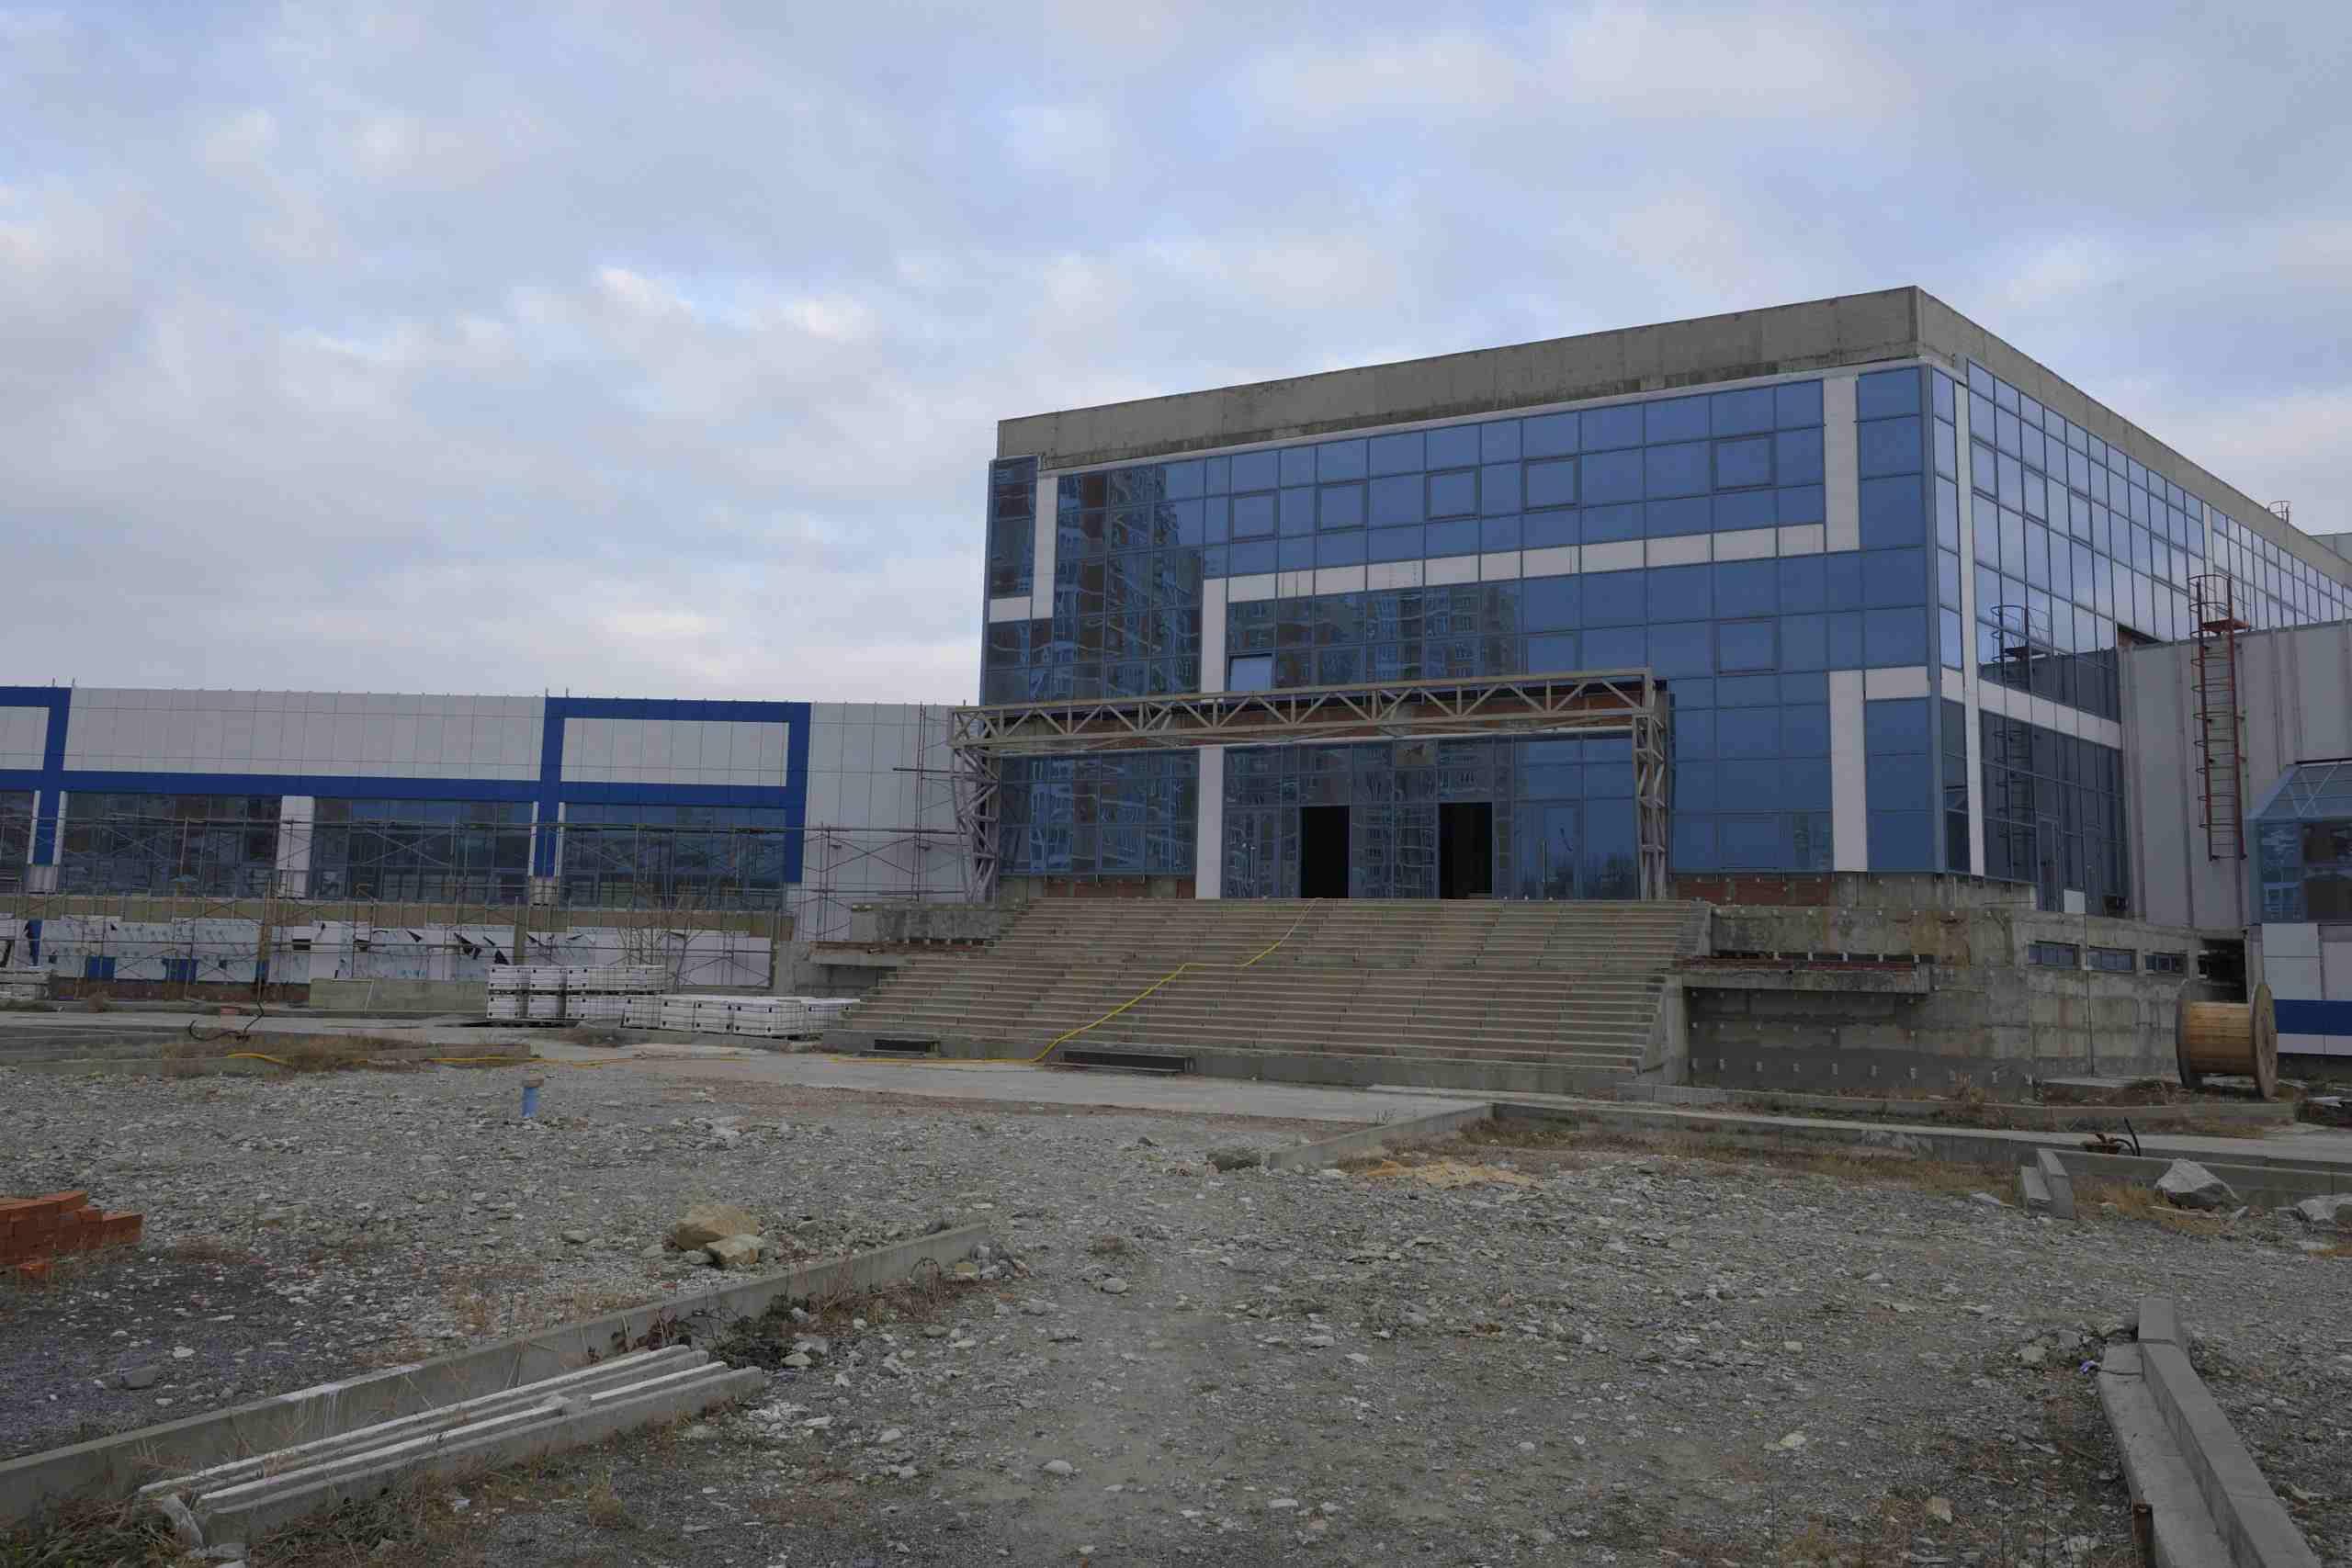 У Новороссийска появился шанс достроить Дворец олимпийских видов спорта «Черноморский»